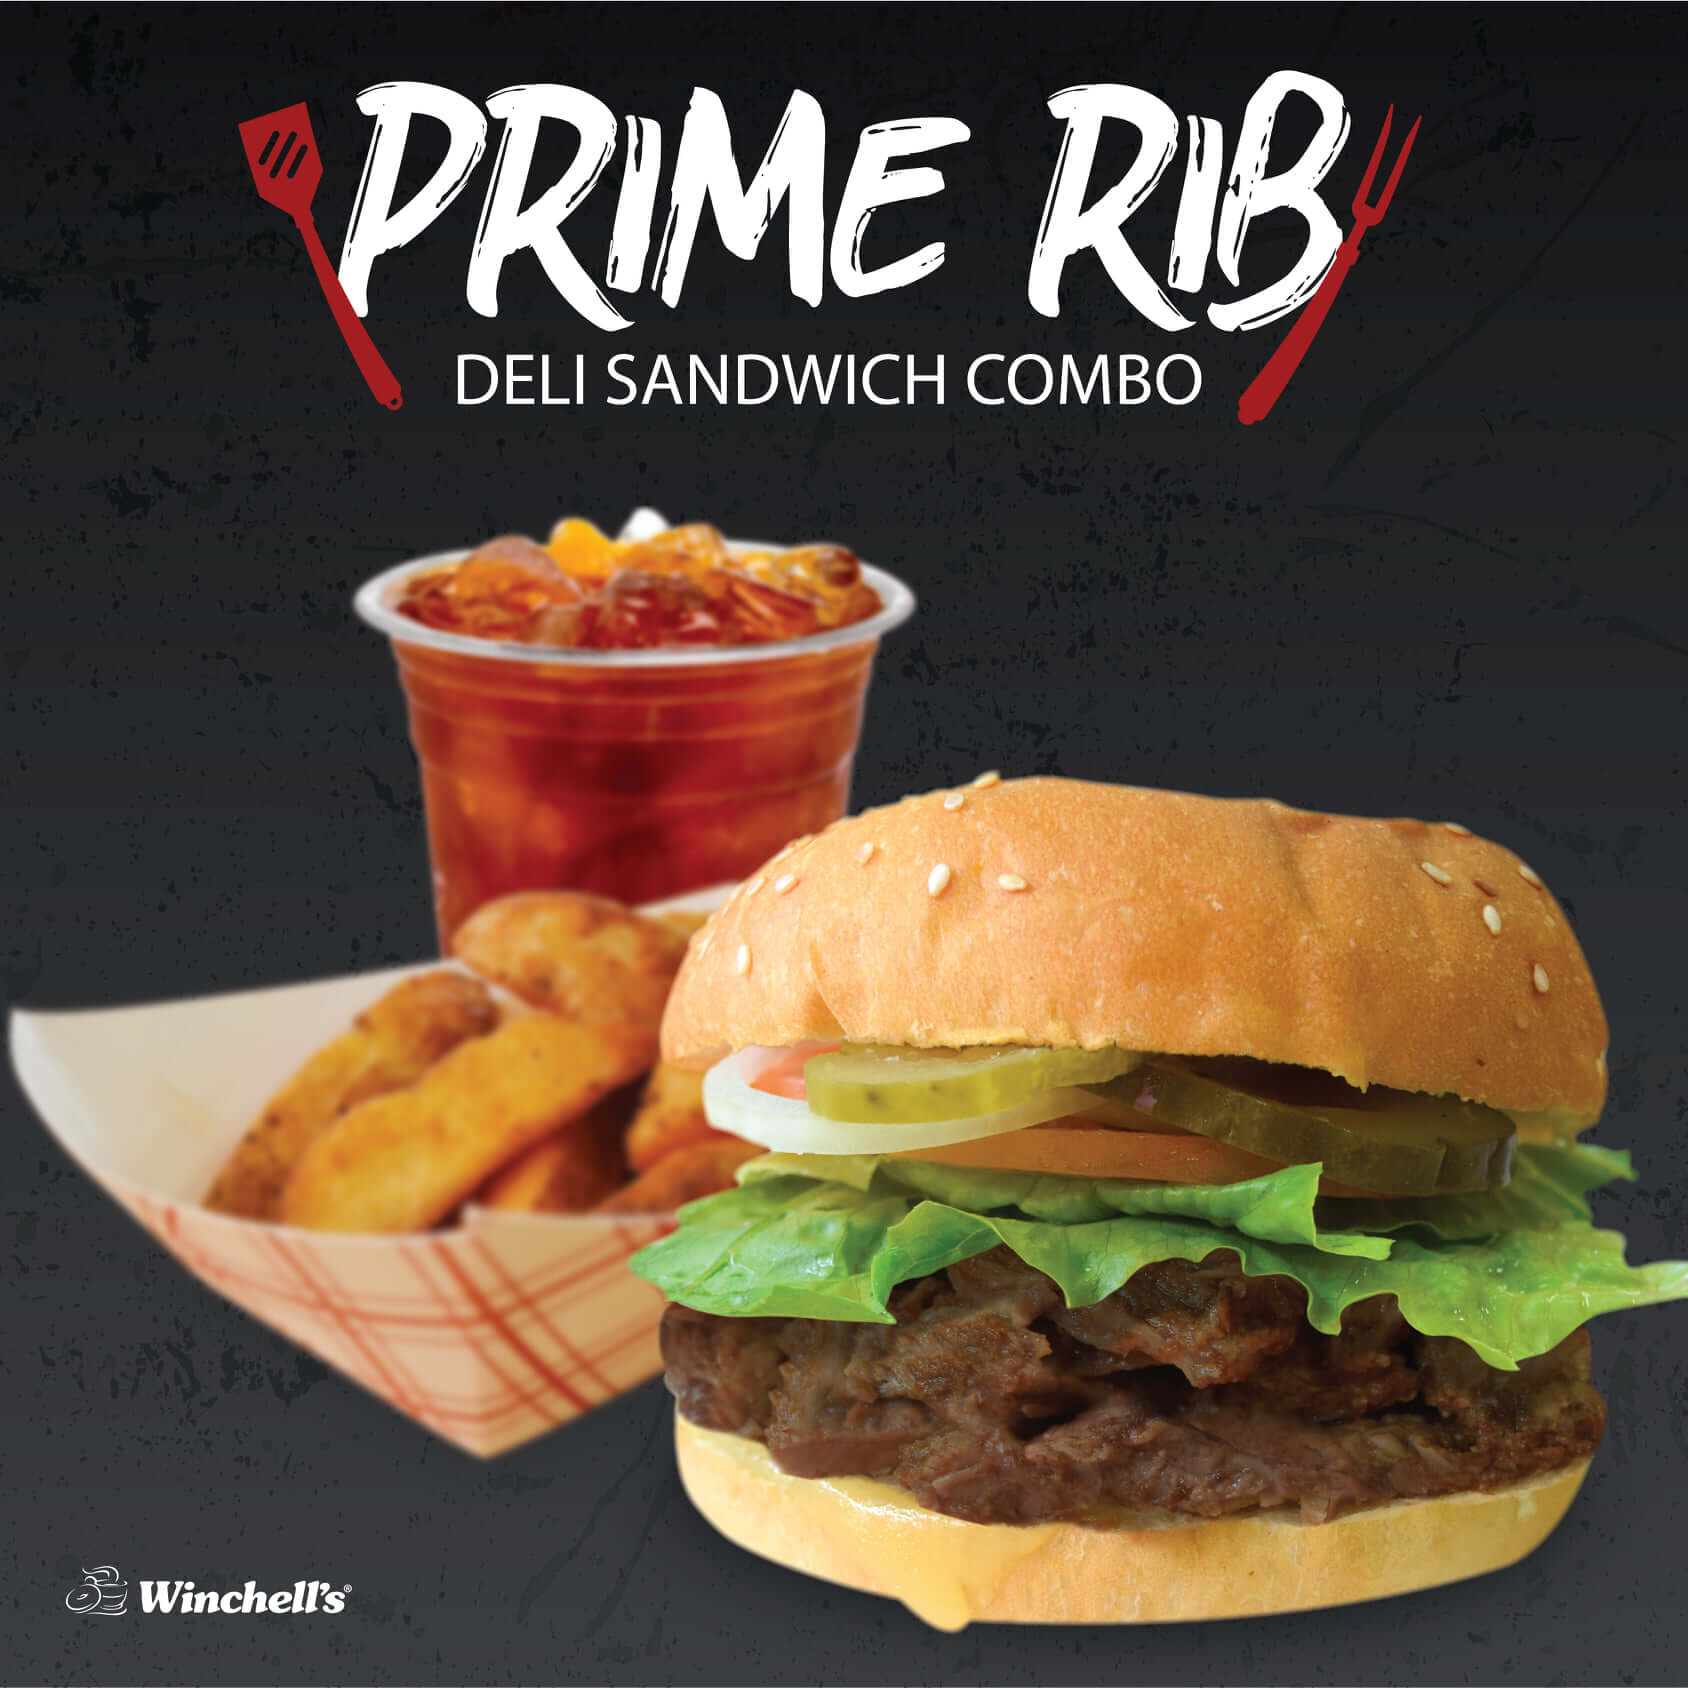 promotions - Prime Rib Sandwich Combo